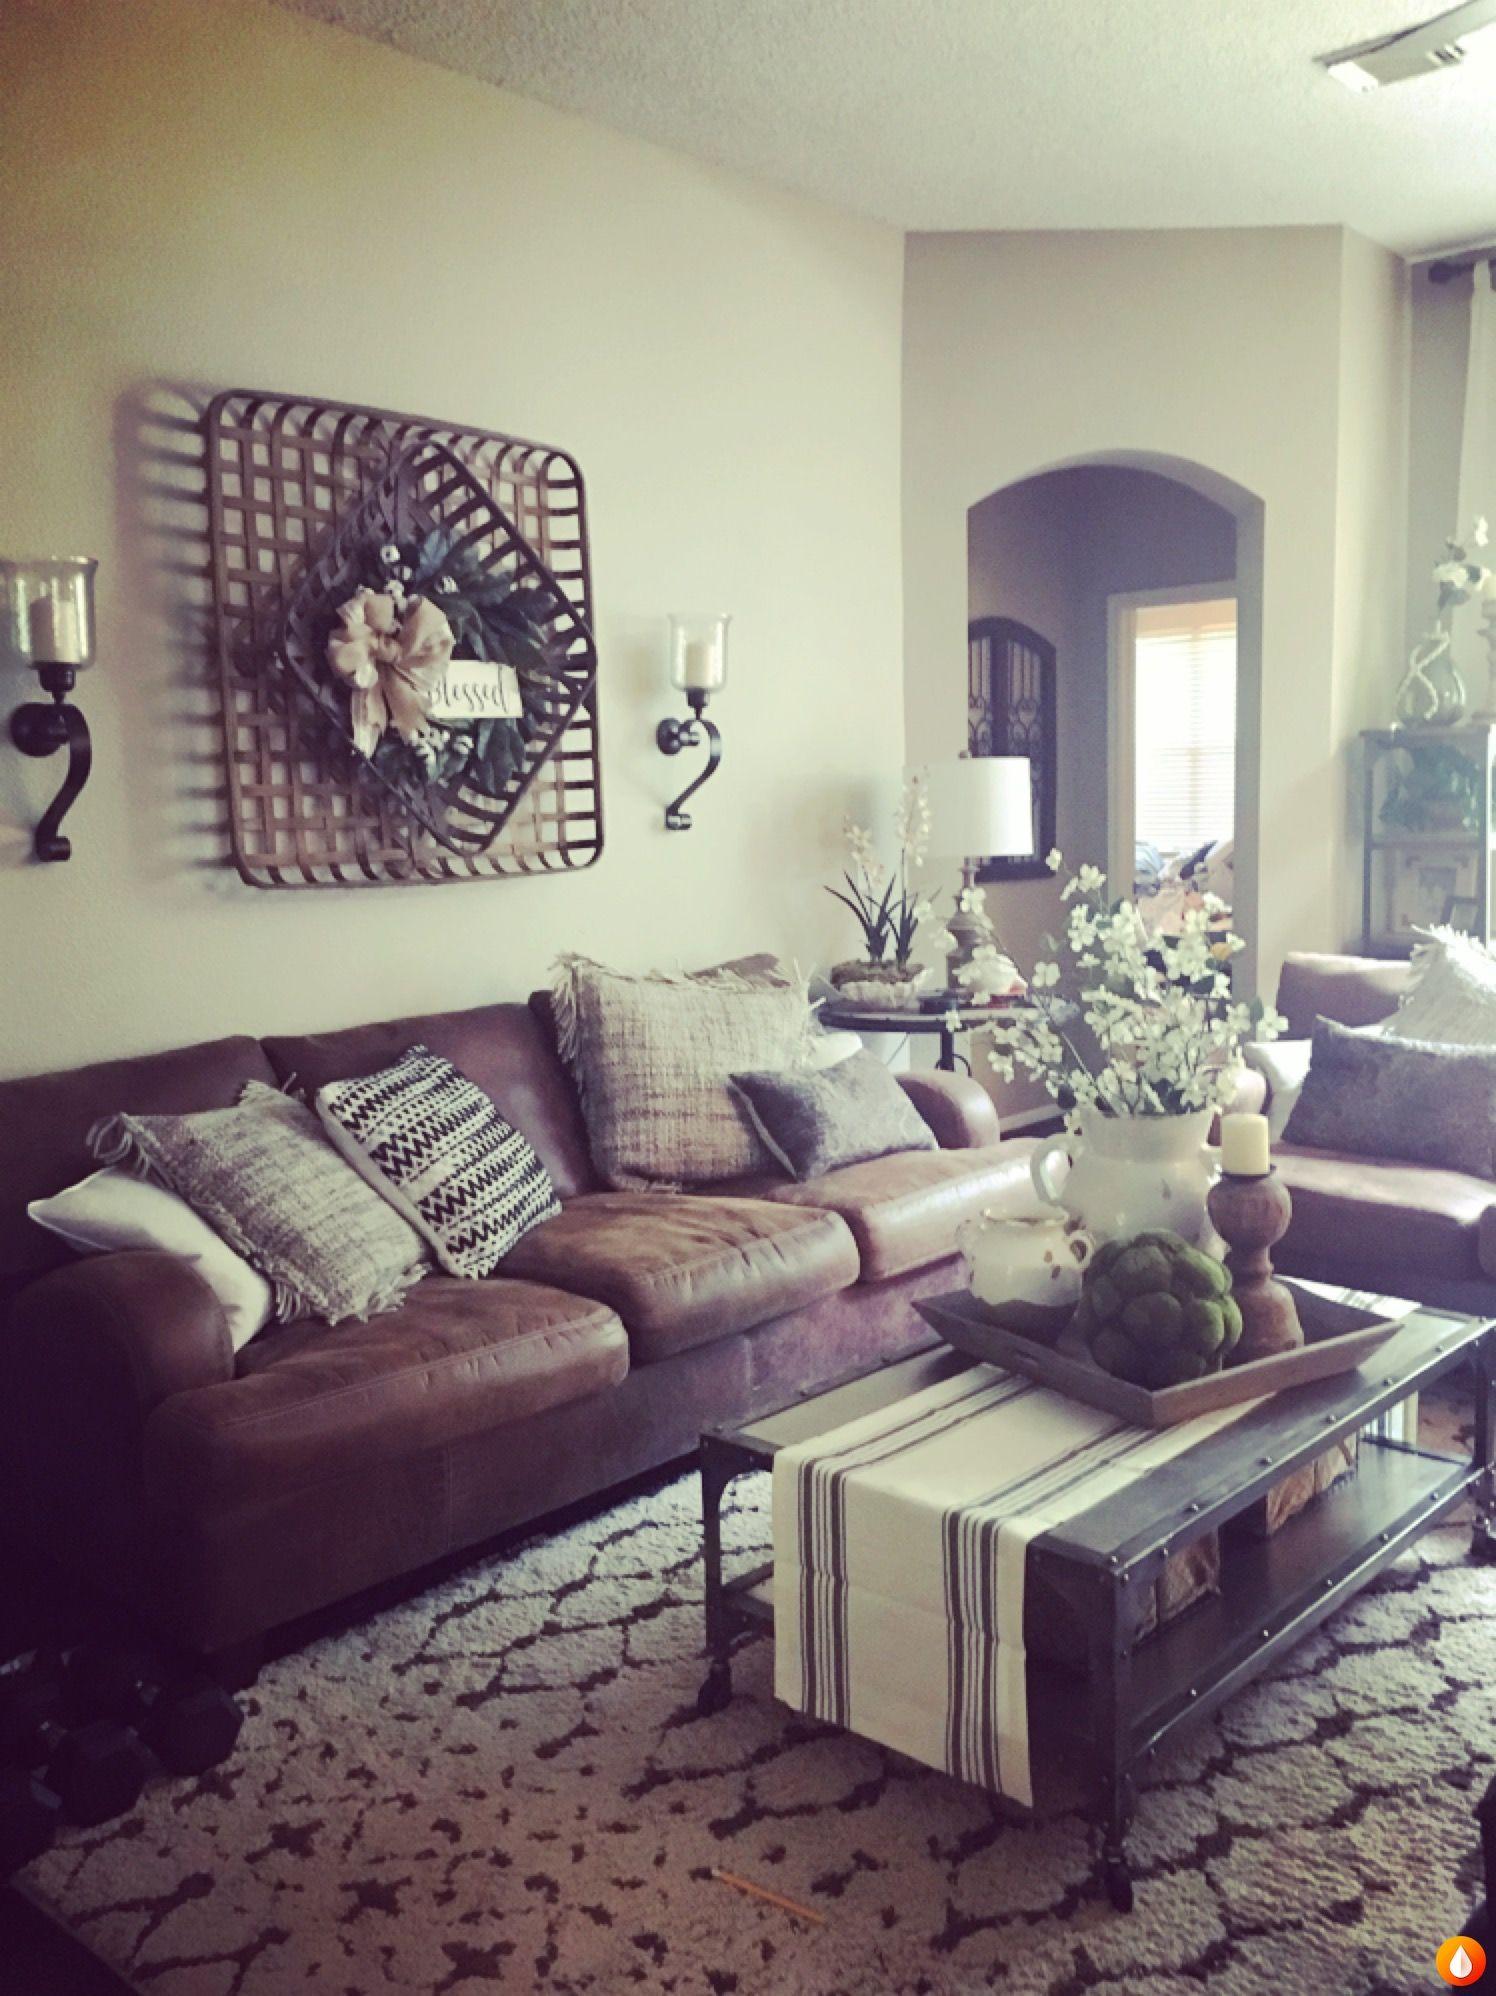 Farmhouse living room decor in my home new also house ideas pinterest rh